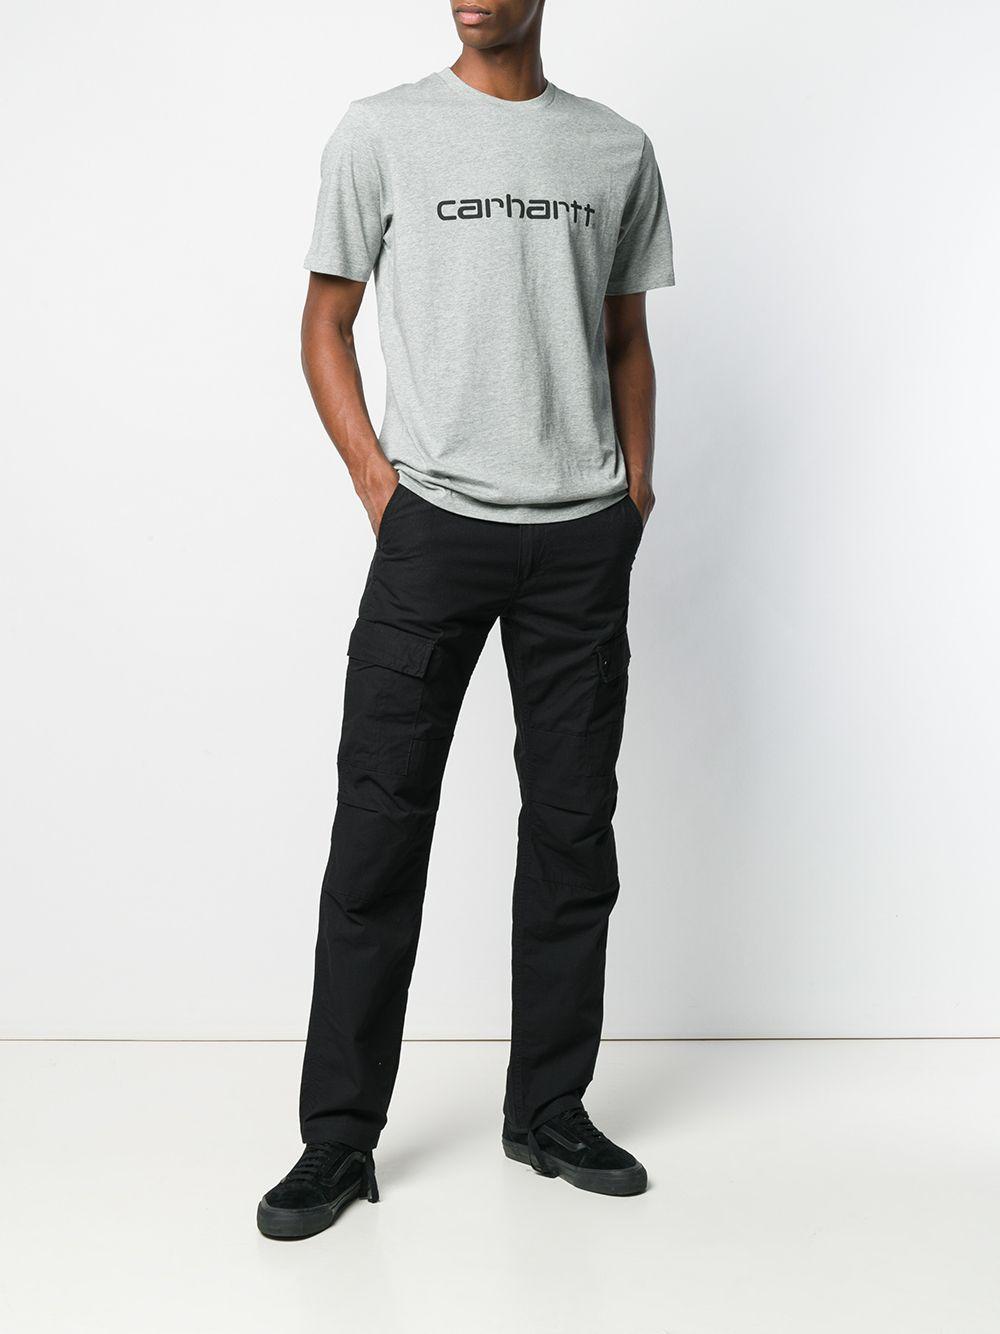 Carhartt avation pant uomo CARHARTT WIP   Pantaloni   I00957889.02